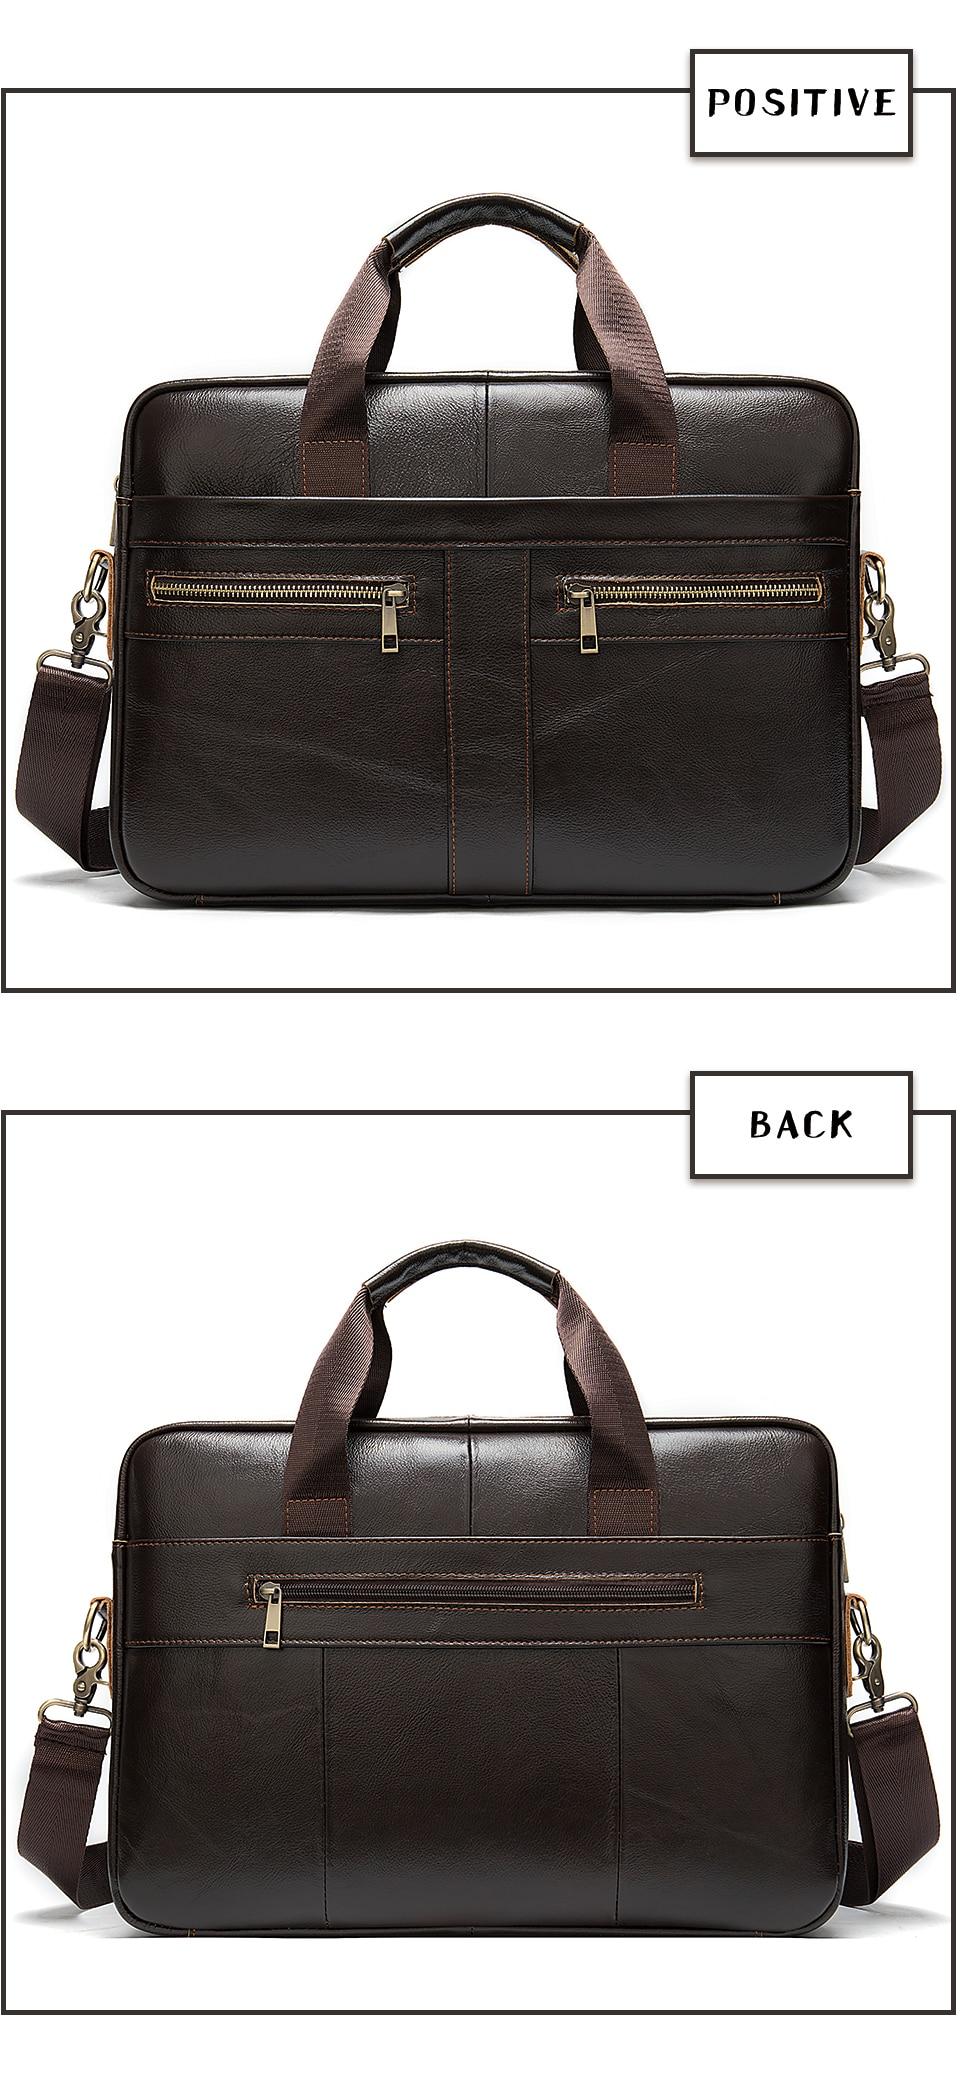 H3261d9adbc2b437288d68892143fe0853 WESTAL Bag men's Genuine Leather briefcase Male man laptop bag natural Leather for men Messenger bags men's briefcases 2019